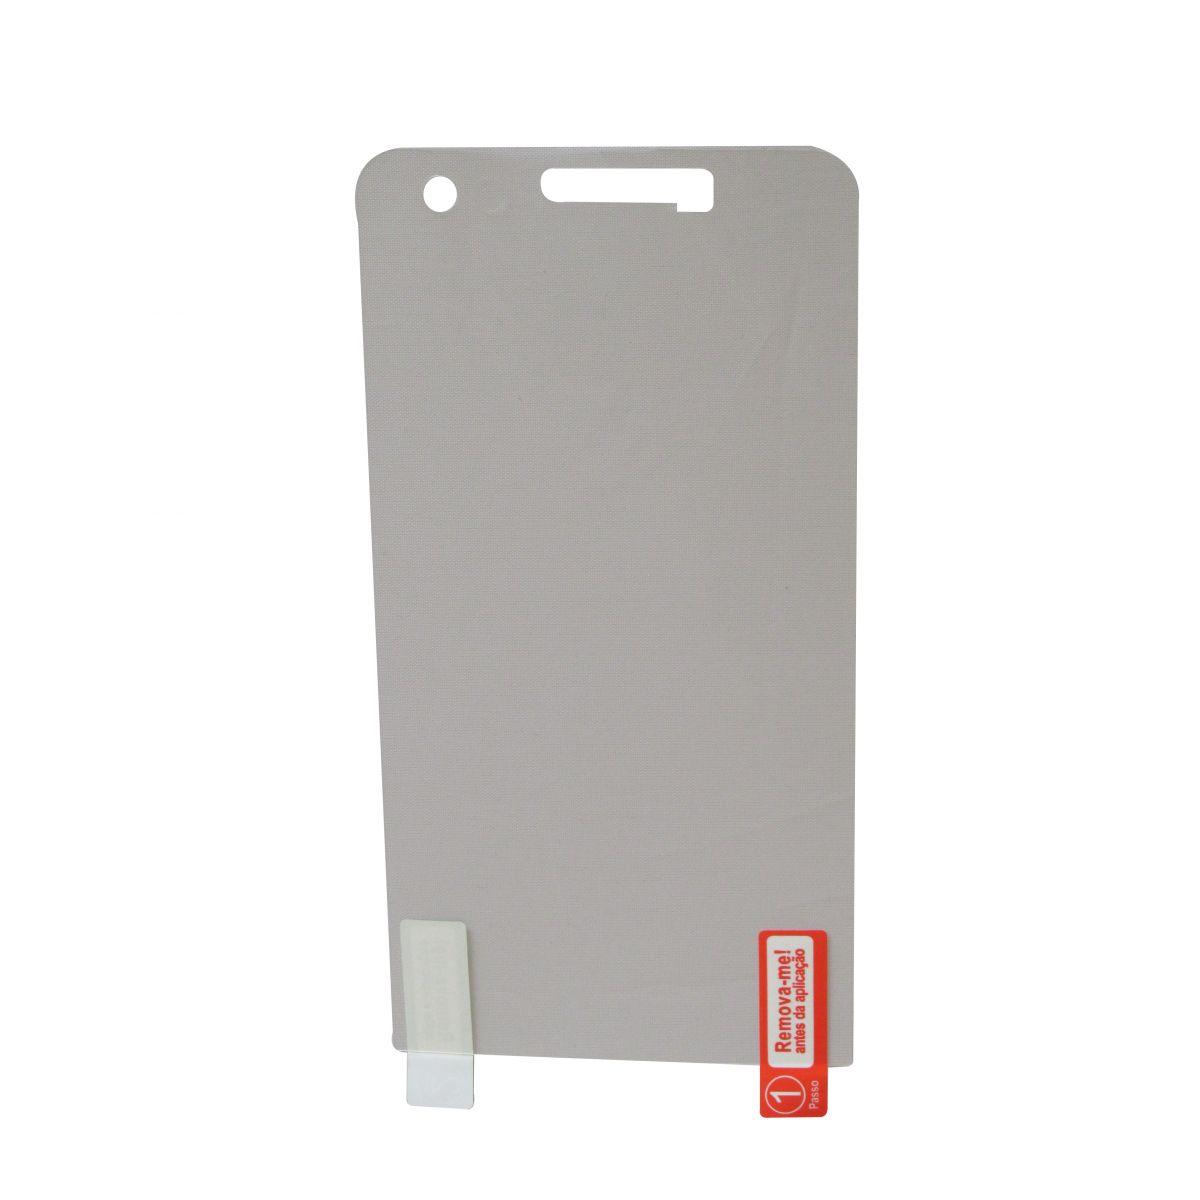 Pelicula Protetora para Asus Zenfone 5 A501 Fosca